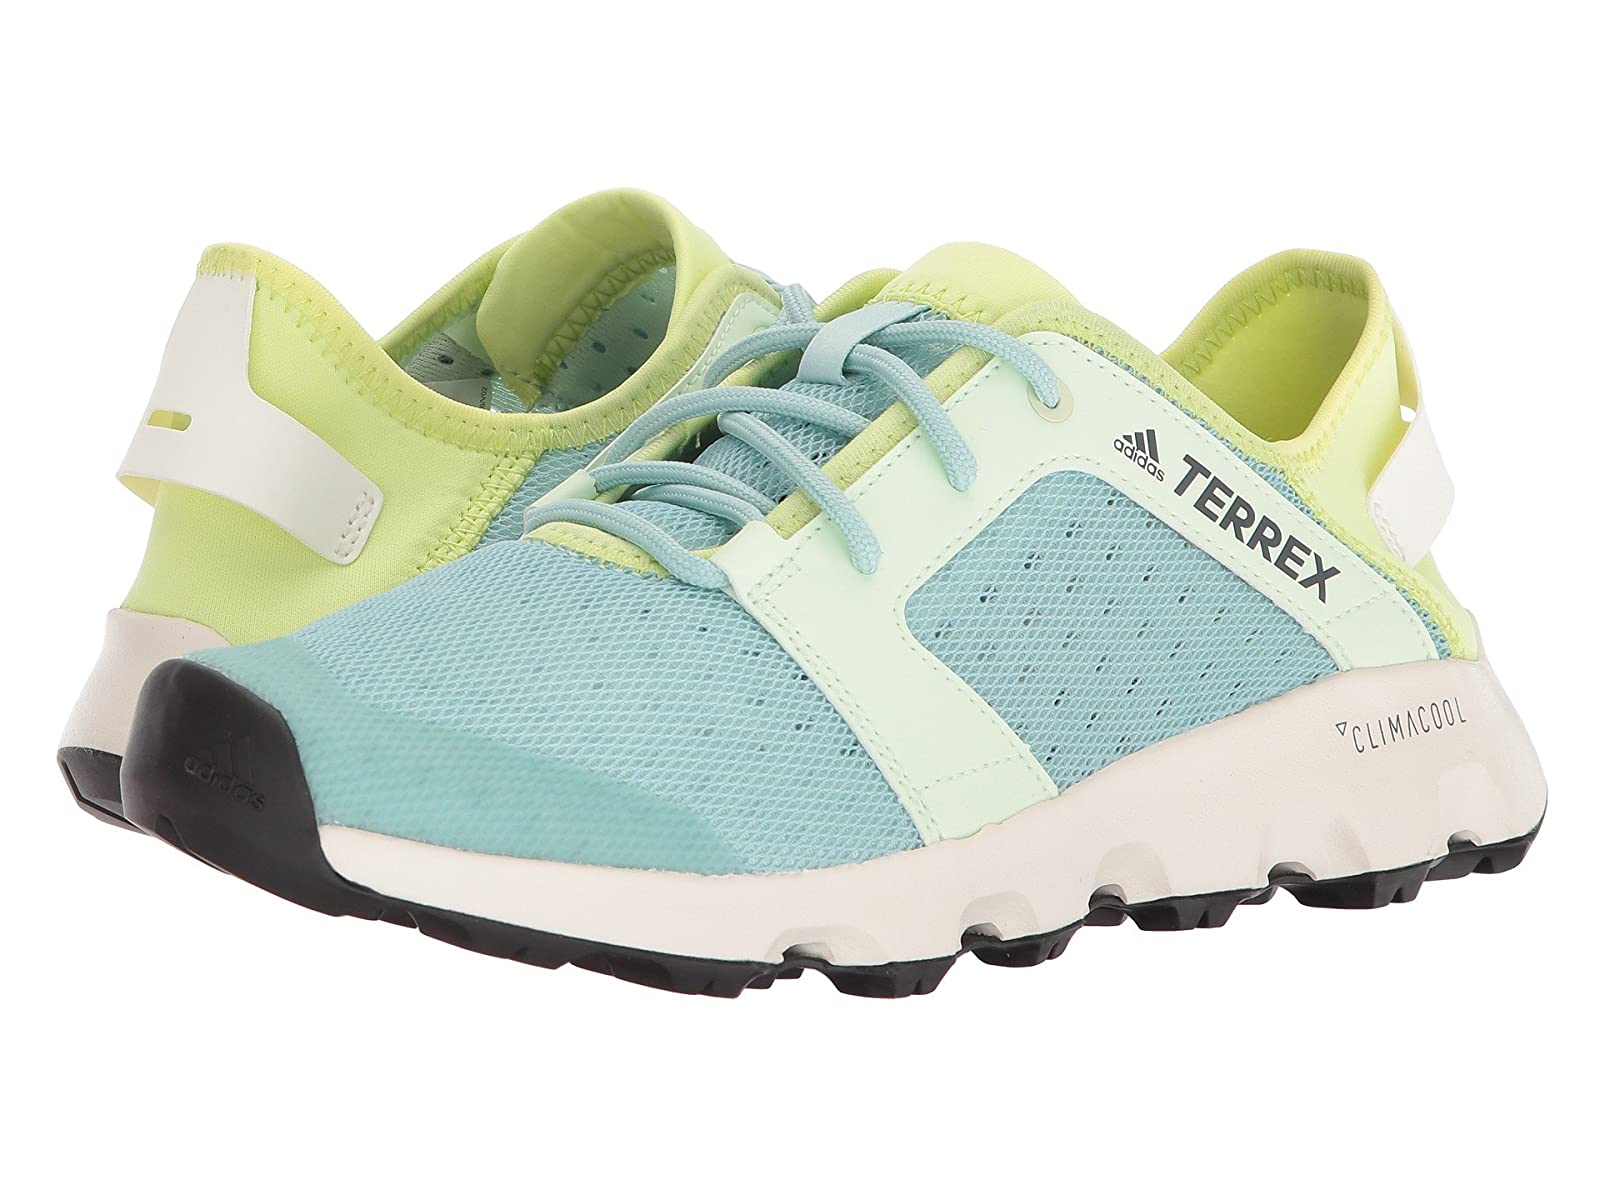 adidas Outdoor Terrex CC Voyager SleekAtmospheric grades have affordable shoes